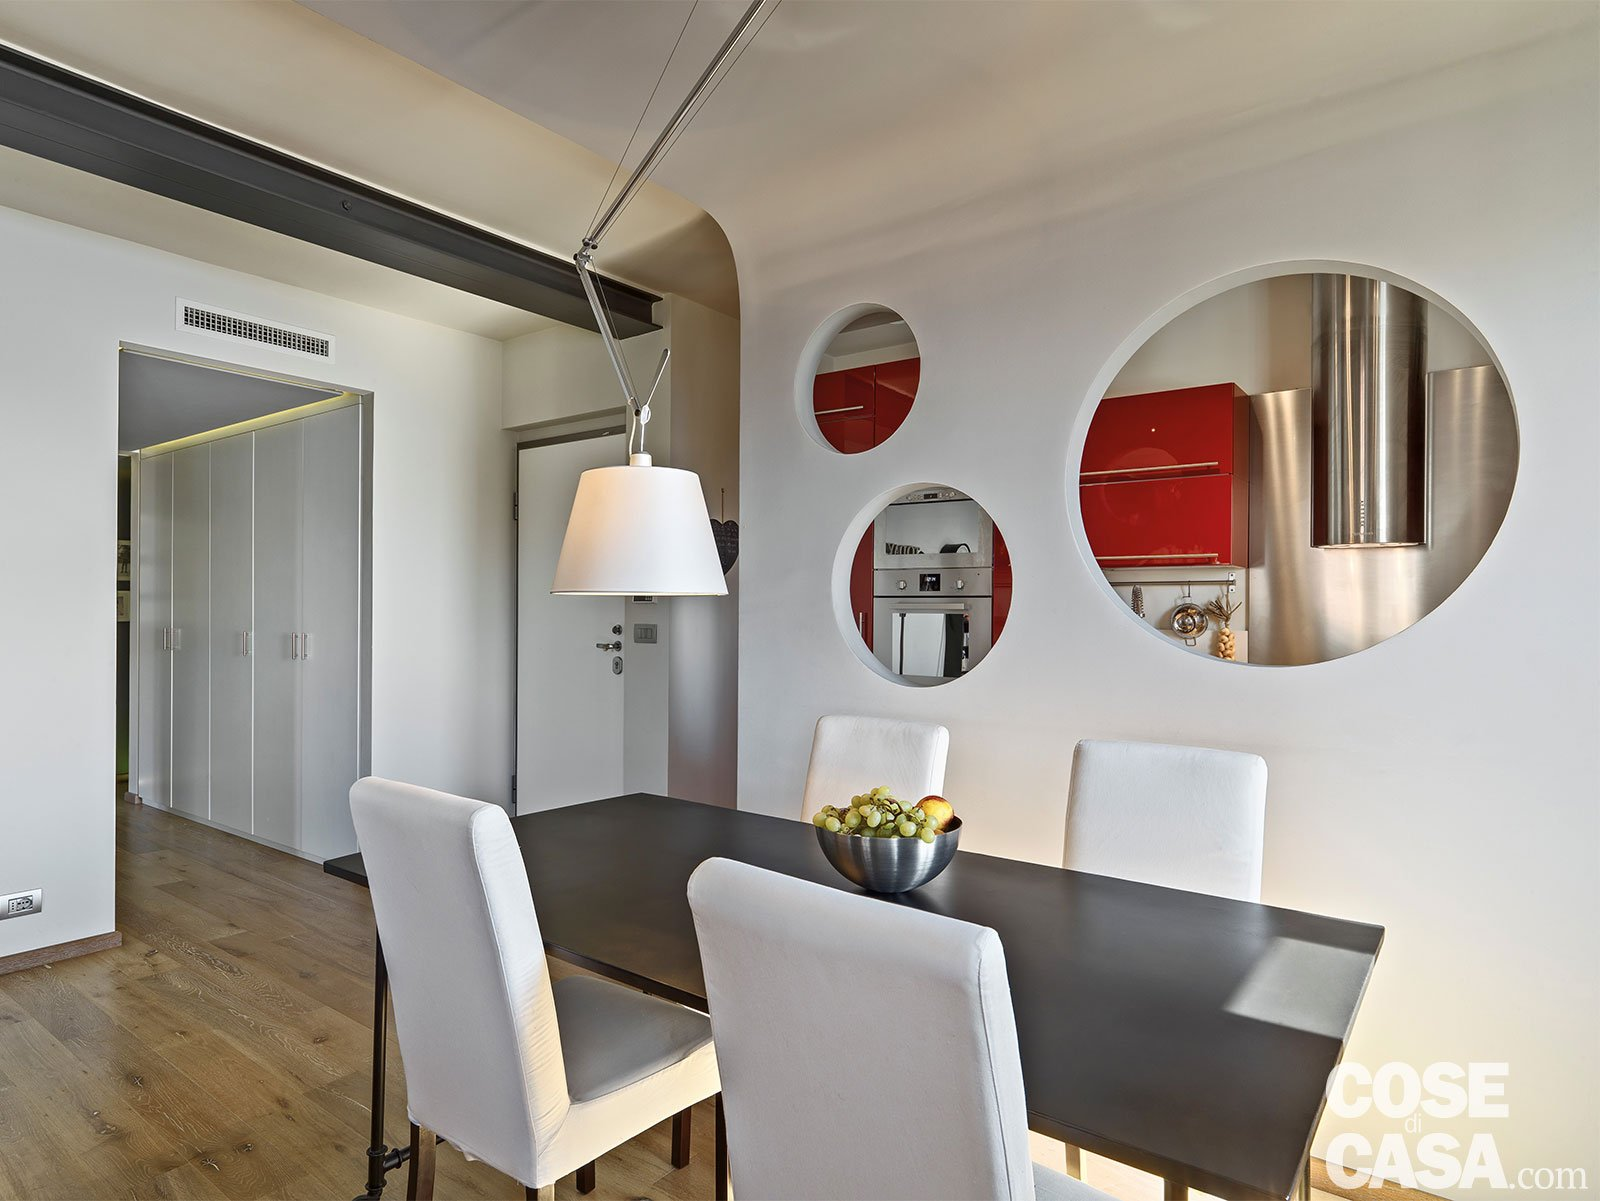 Pareti Divisorie Cucina Soggiorno. Interesting Parete Divisoria In ...